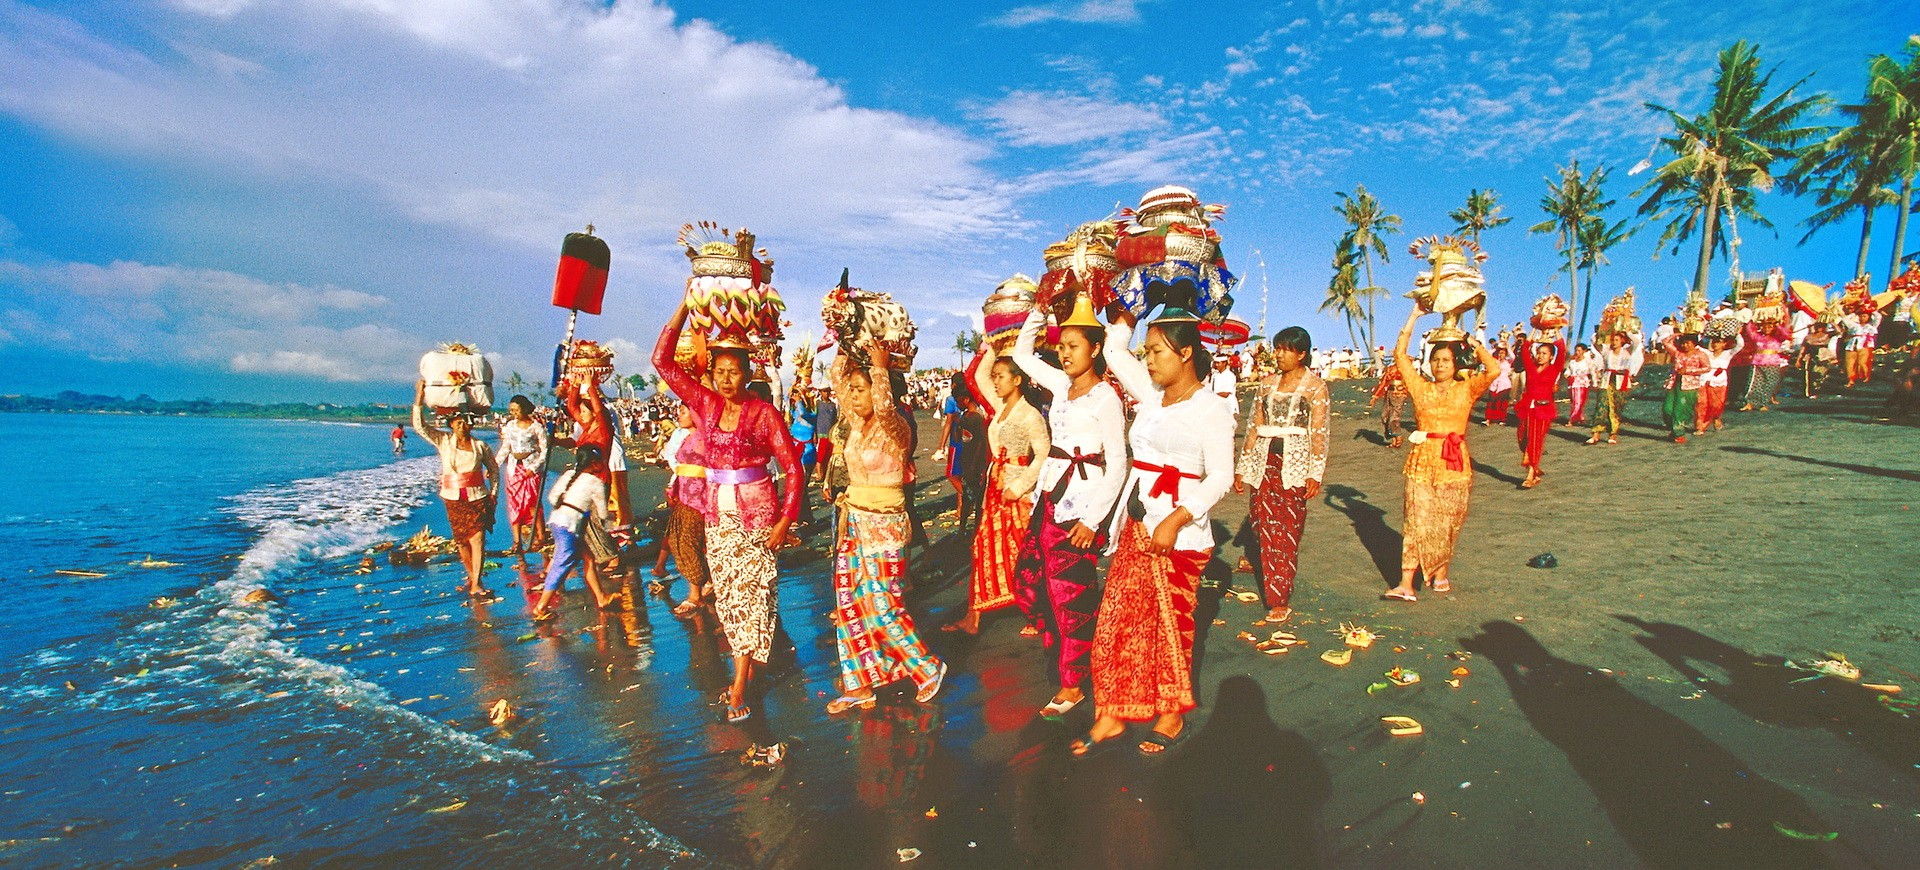 Indonésie Bali Fête de Besakhi